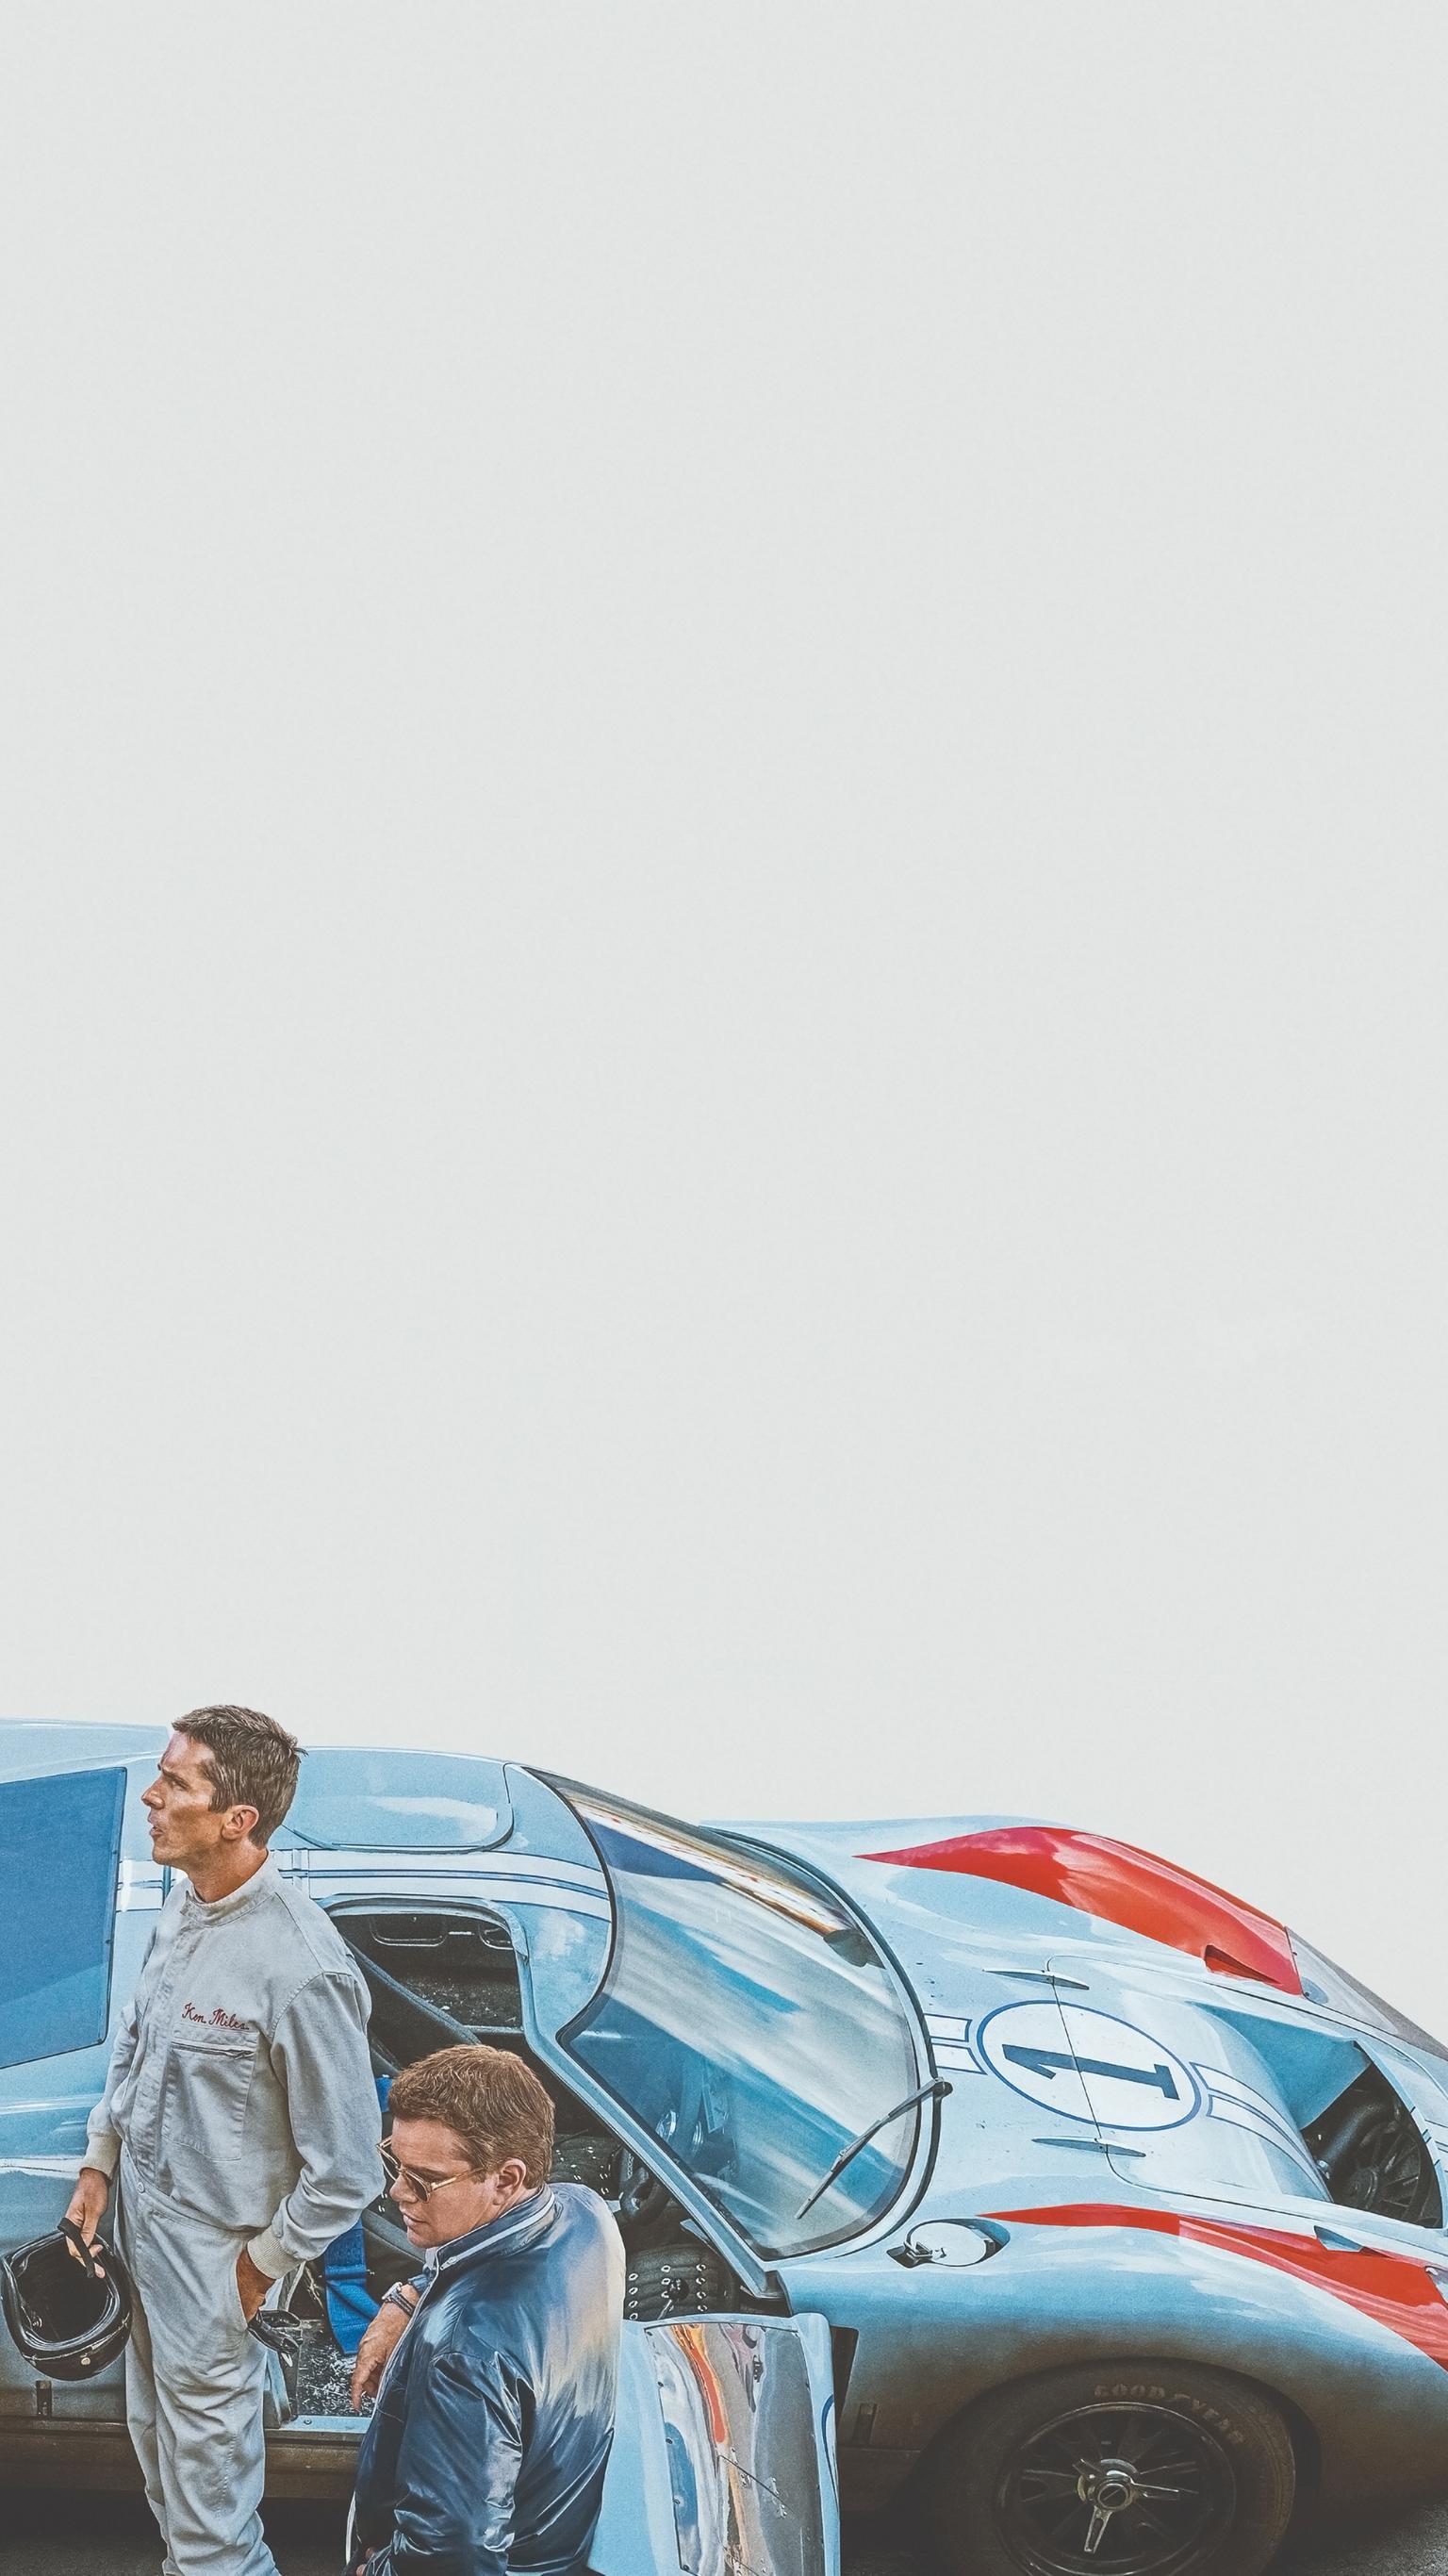 Free Download Ford V Ferrari 2019 Phone Wallpaper Moviemania 1536x2732 For Your Desktop Mobile Tablet Explore 46 Ken Miles Wallpapers Ken Miles Wallpapers Miles Teller Wallpapers Miles Morales Wallpapers